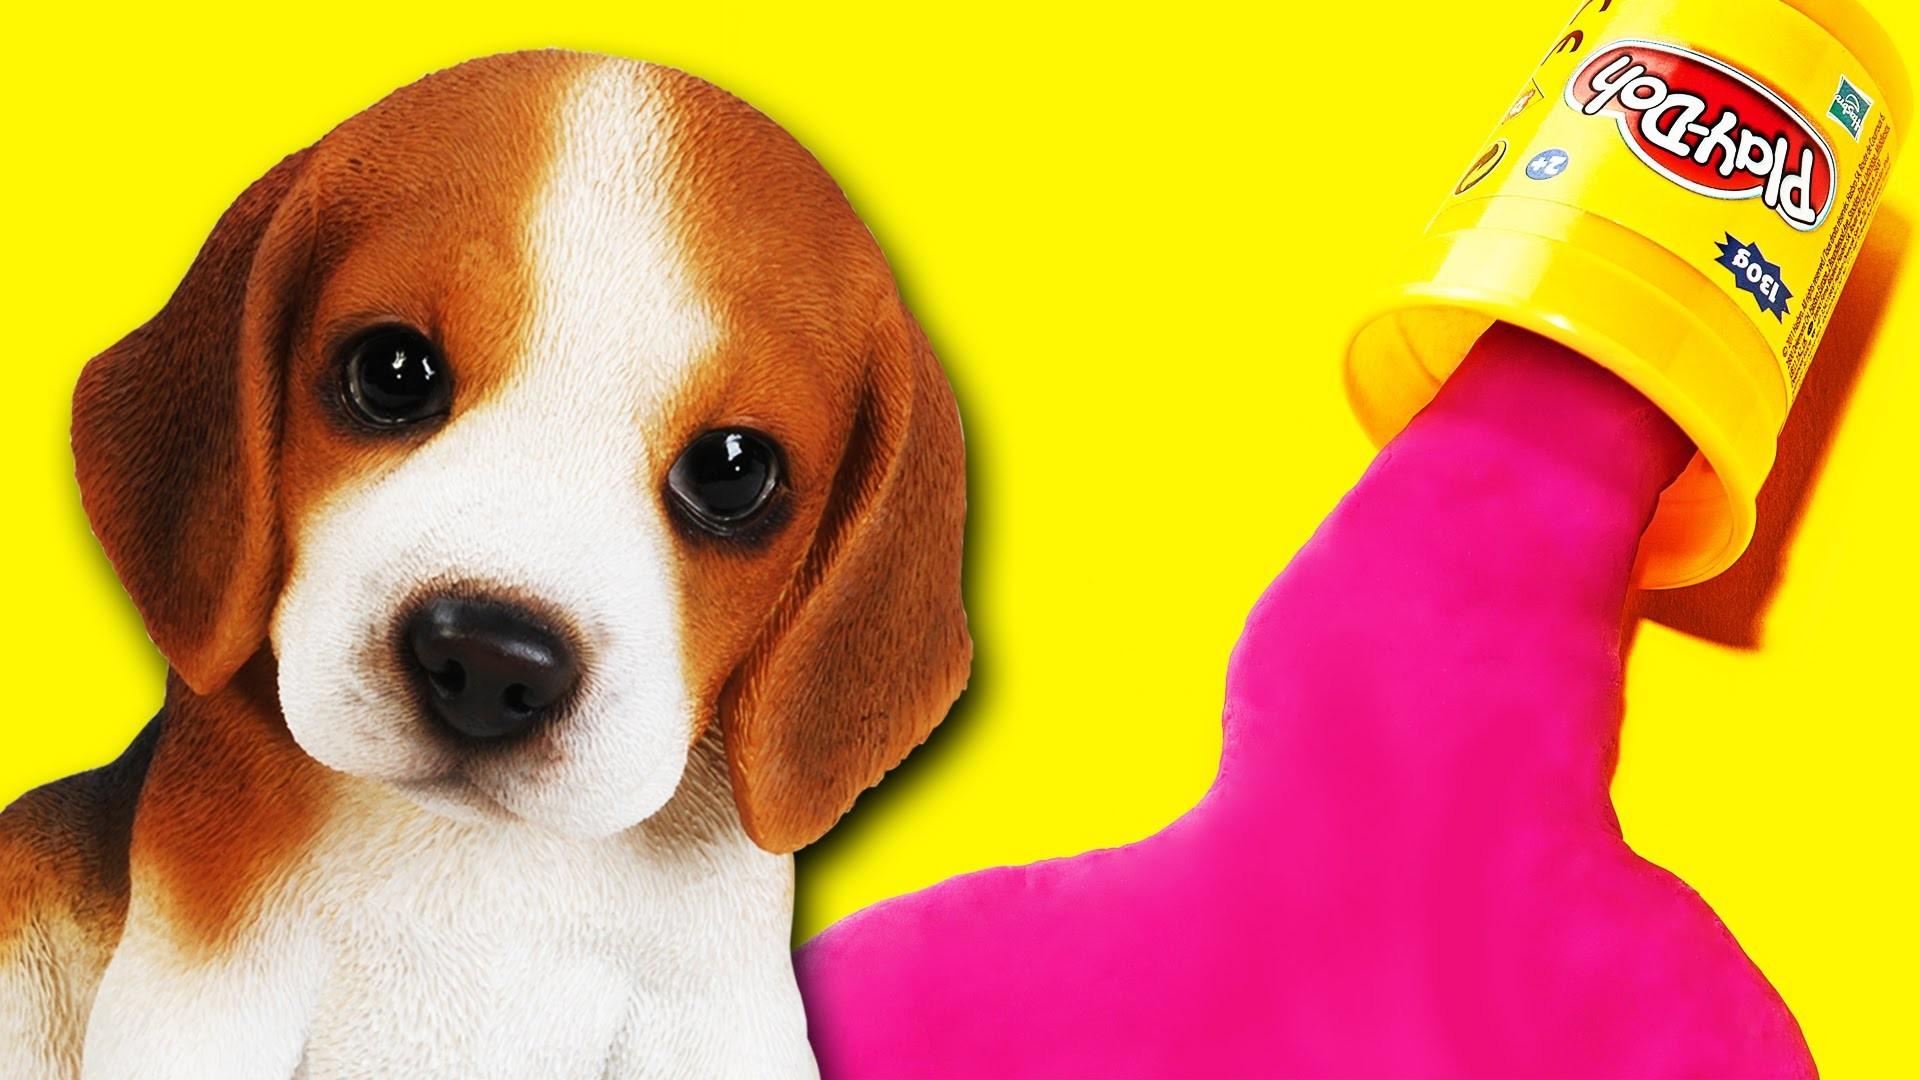 Play Doh animals figures playset - How to make playdough cat & dog